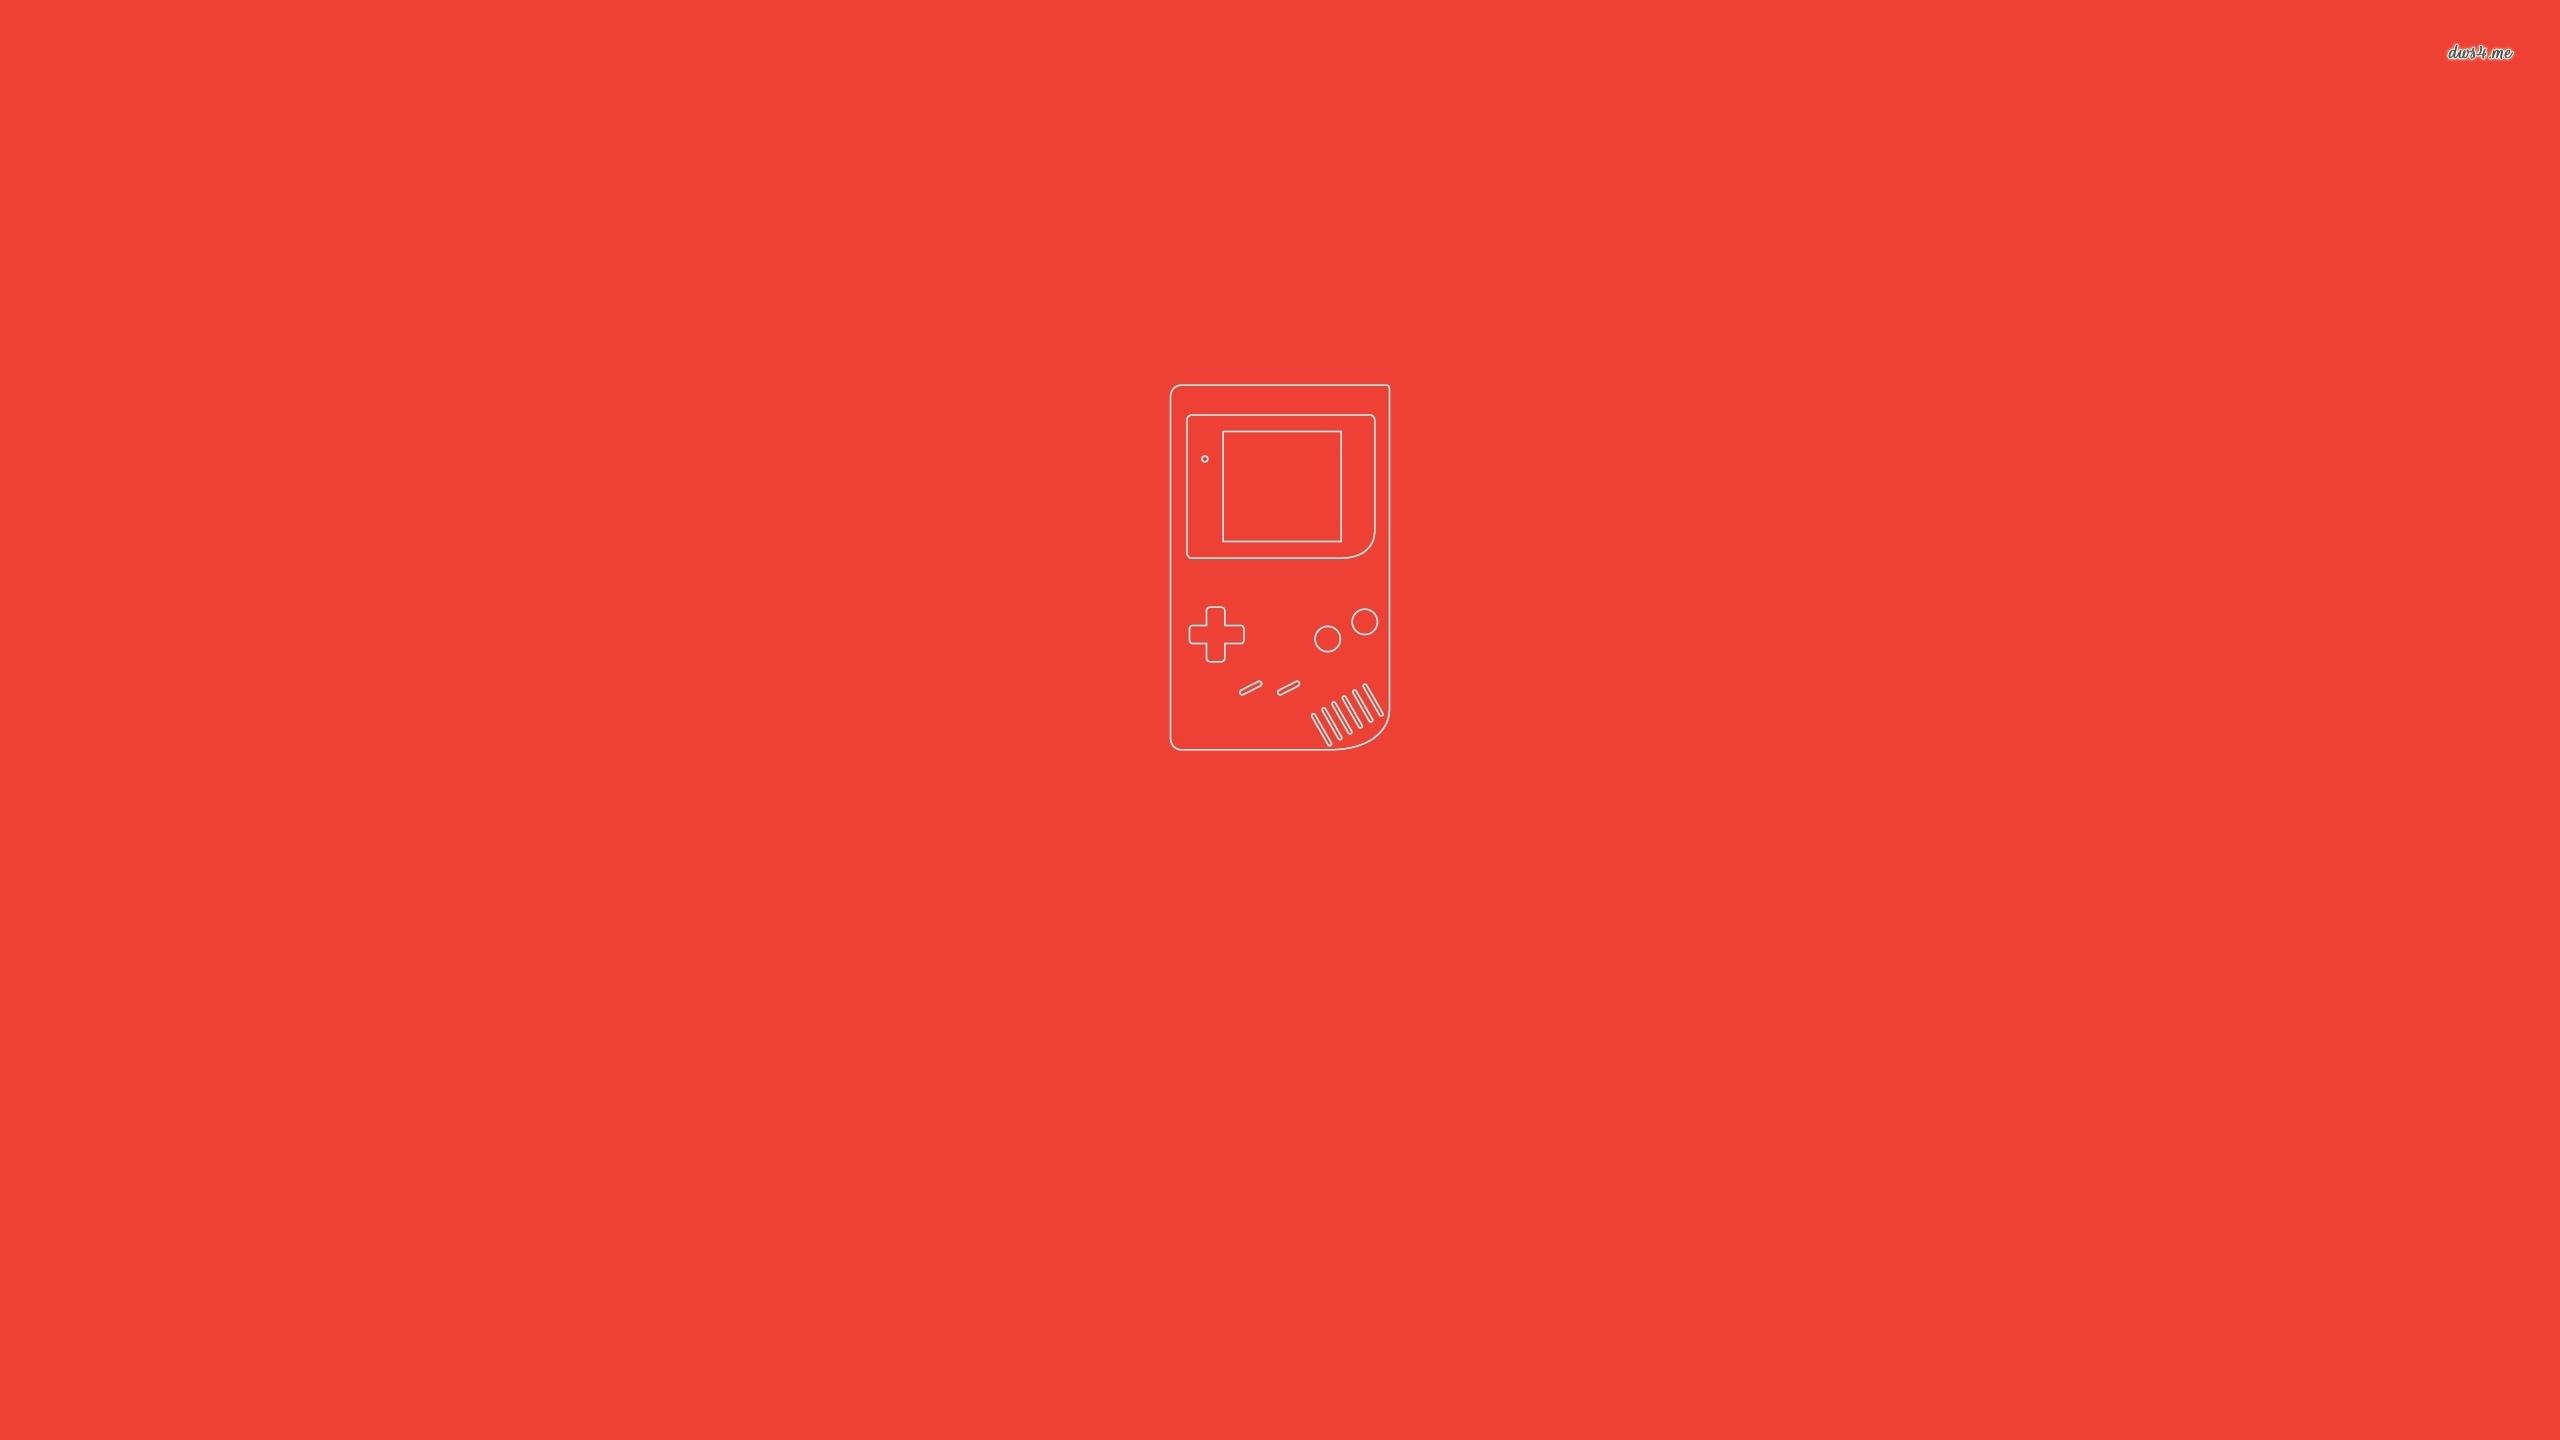 Game Boy wallpaper   Minimalistic wallpapers   39498 2560x1440